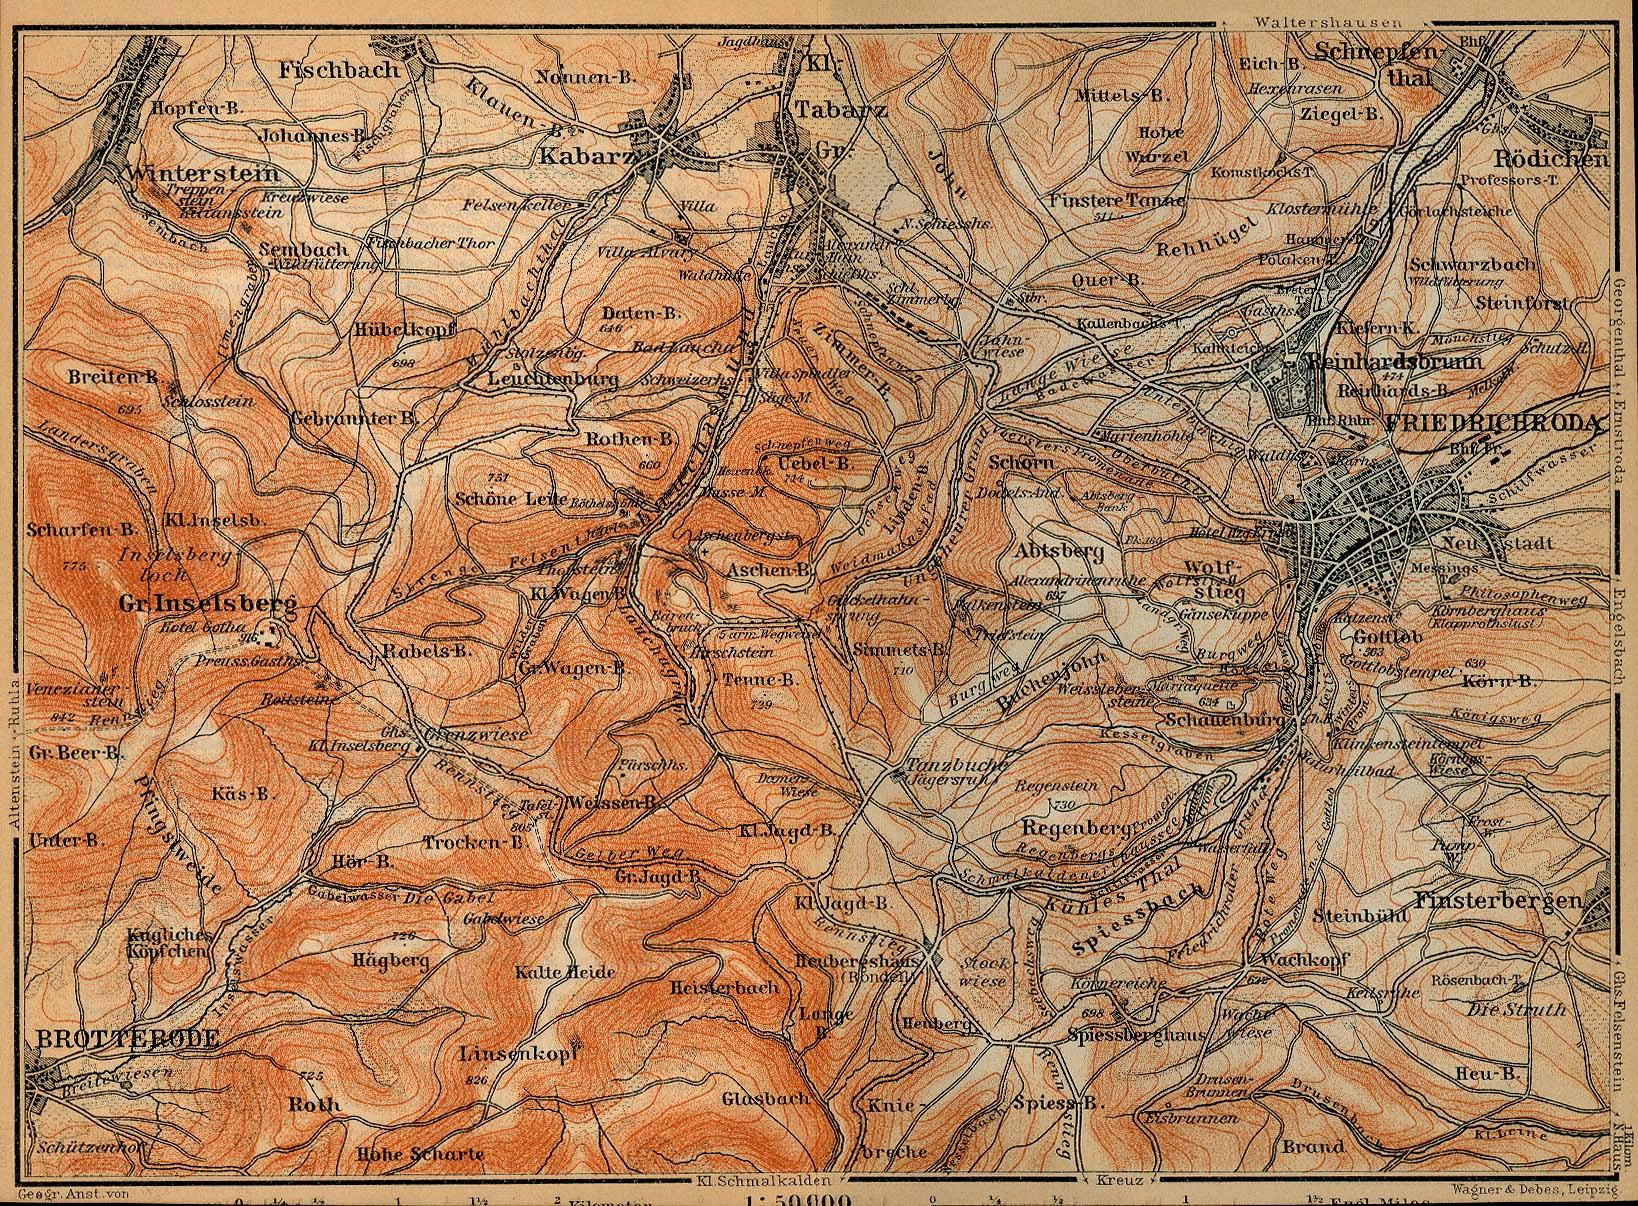 Mapa de las Cercanías de Friedrichroda, Alemania 1910